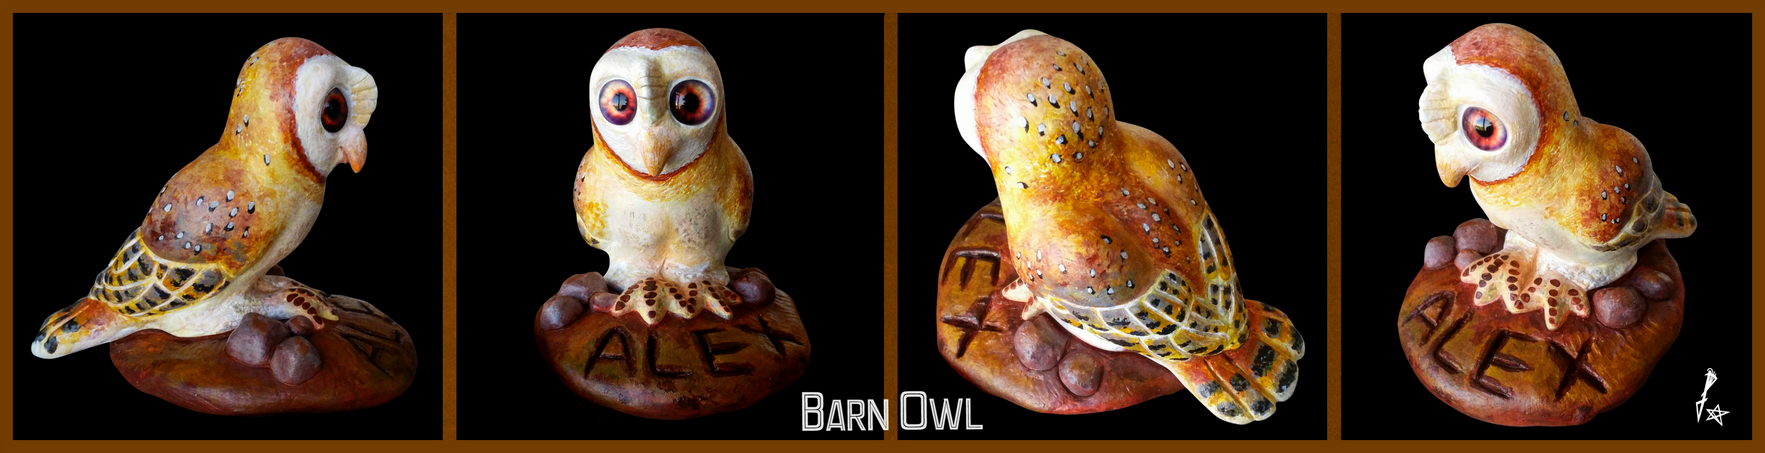 A Barn Owl for Alex (Clay Sculpture)